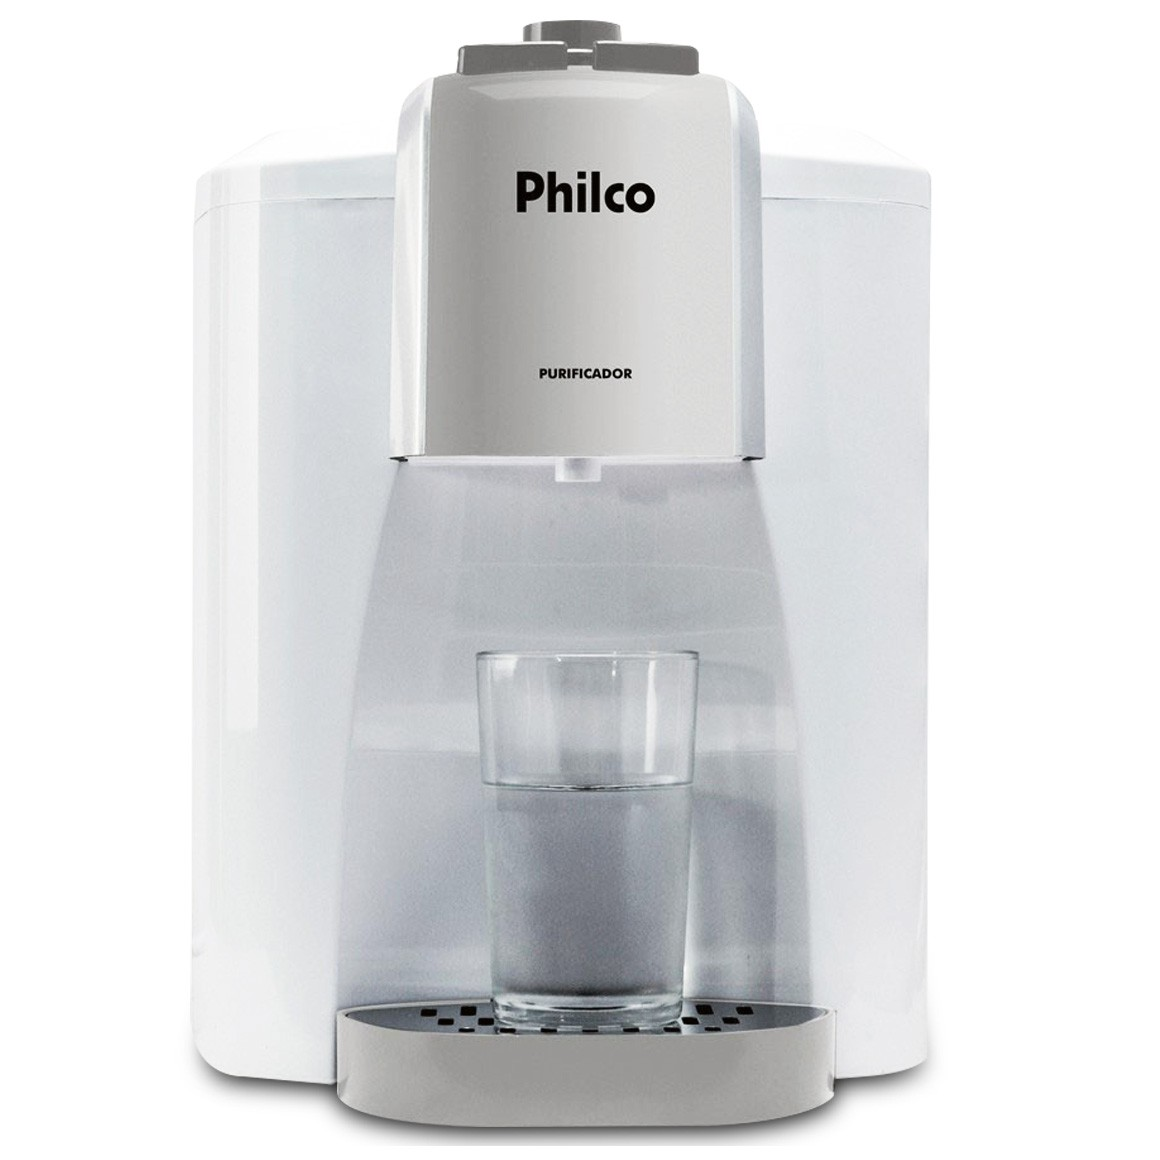 Purificador de Água Ph20 Eletrônico Branco/Cinza Bivolt - Philco